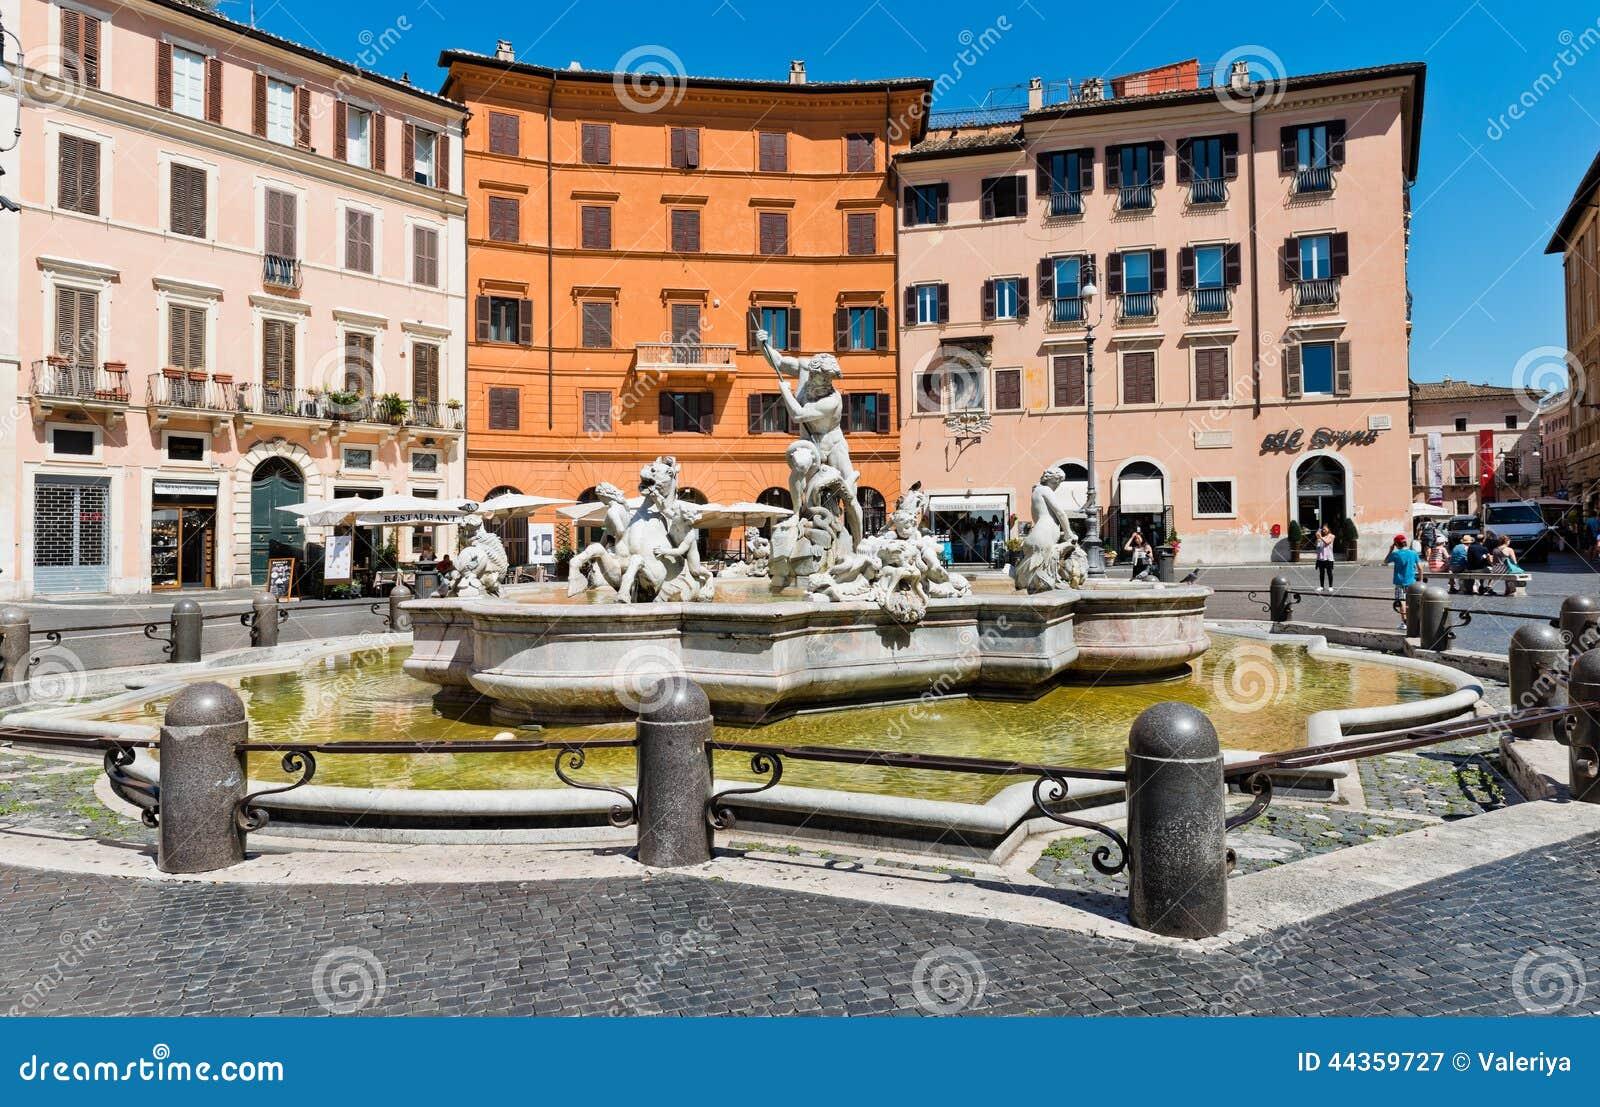 Piazza Navona, fontana di Nettuno a Roma, Italia